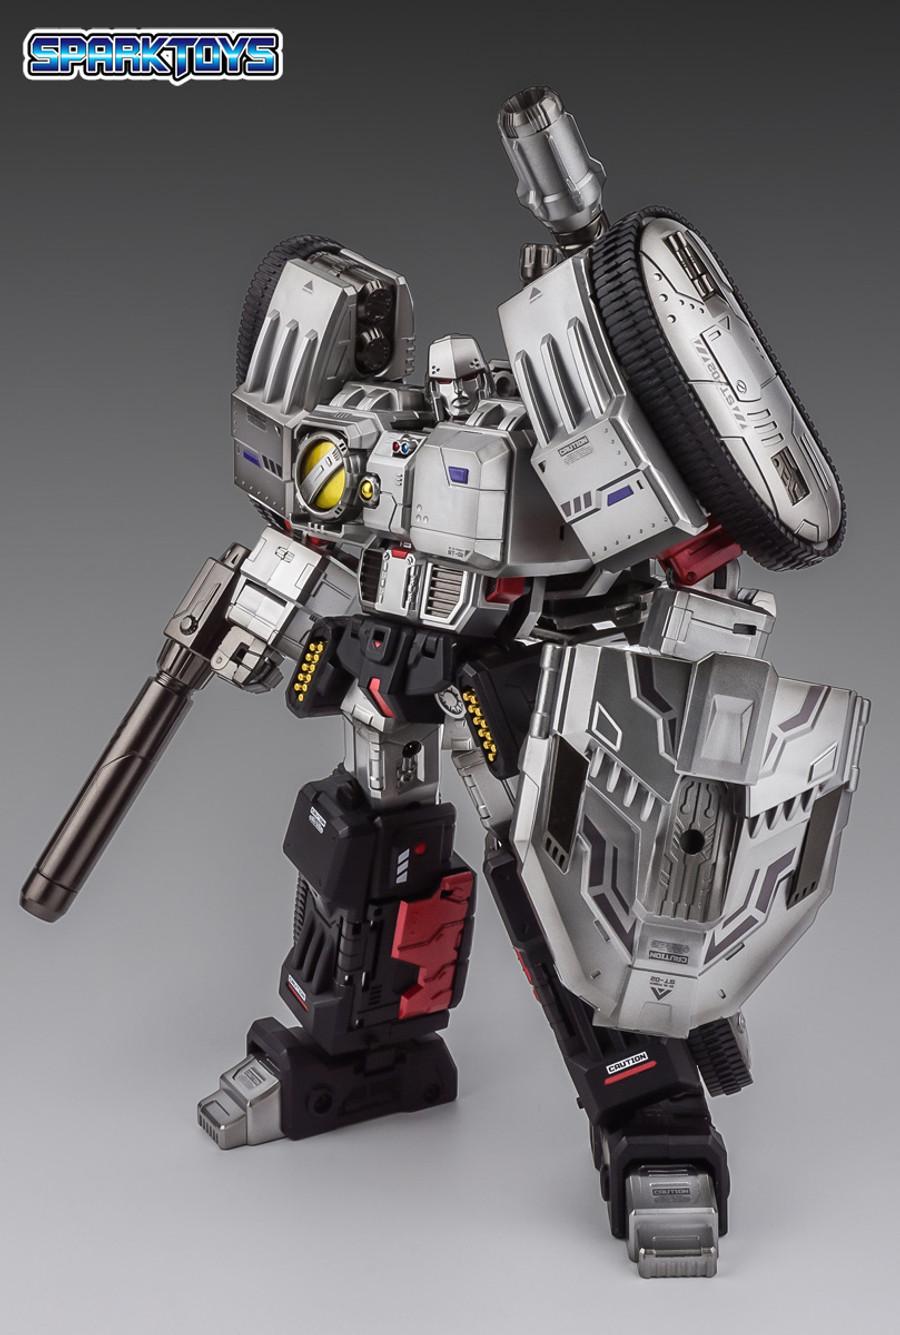 Spark Toy - ST02